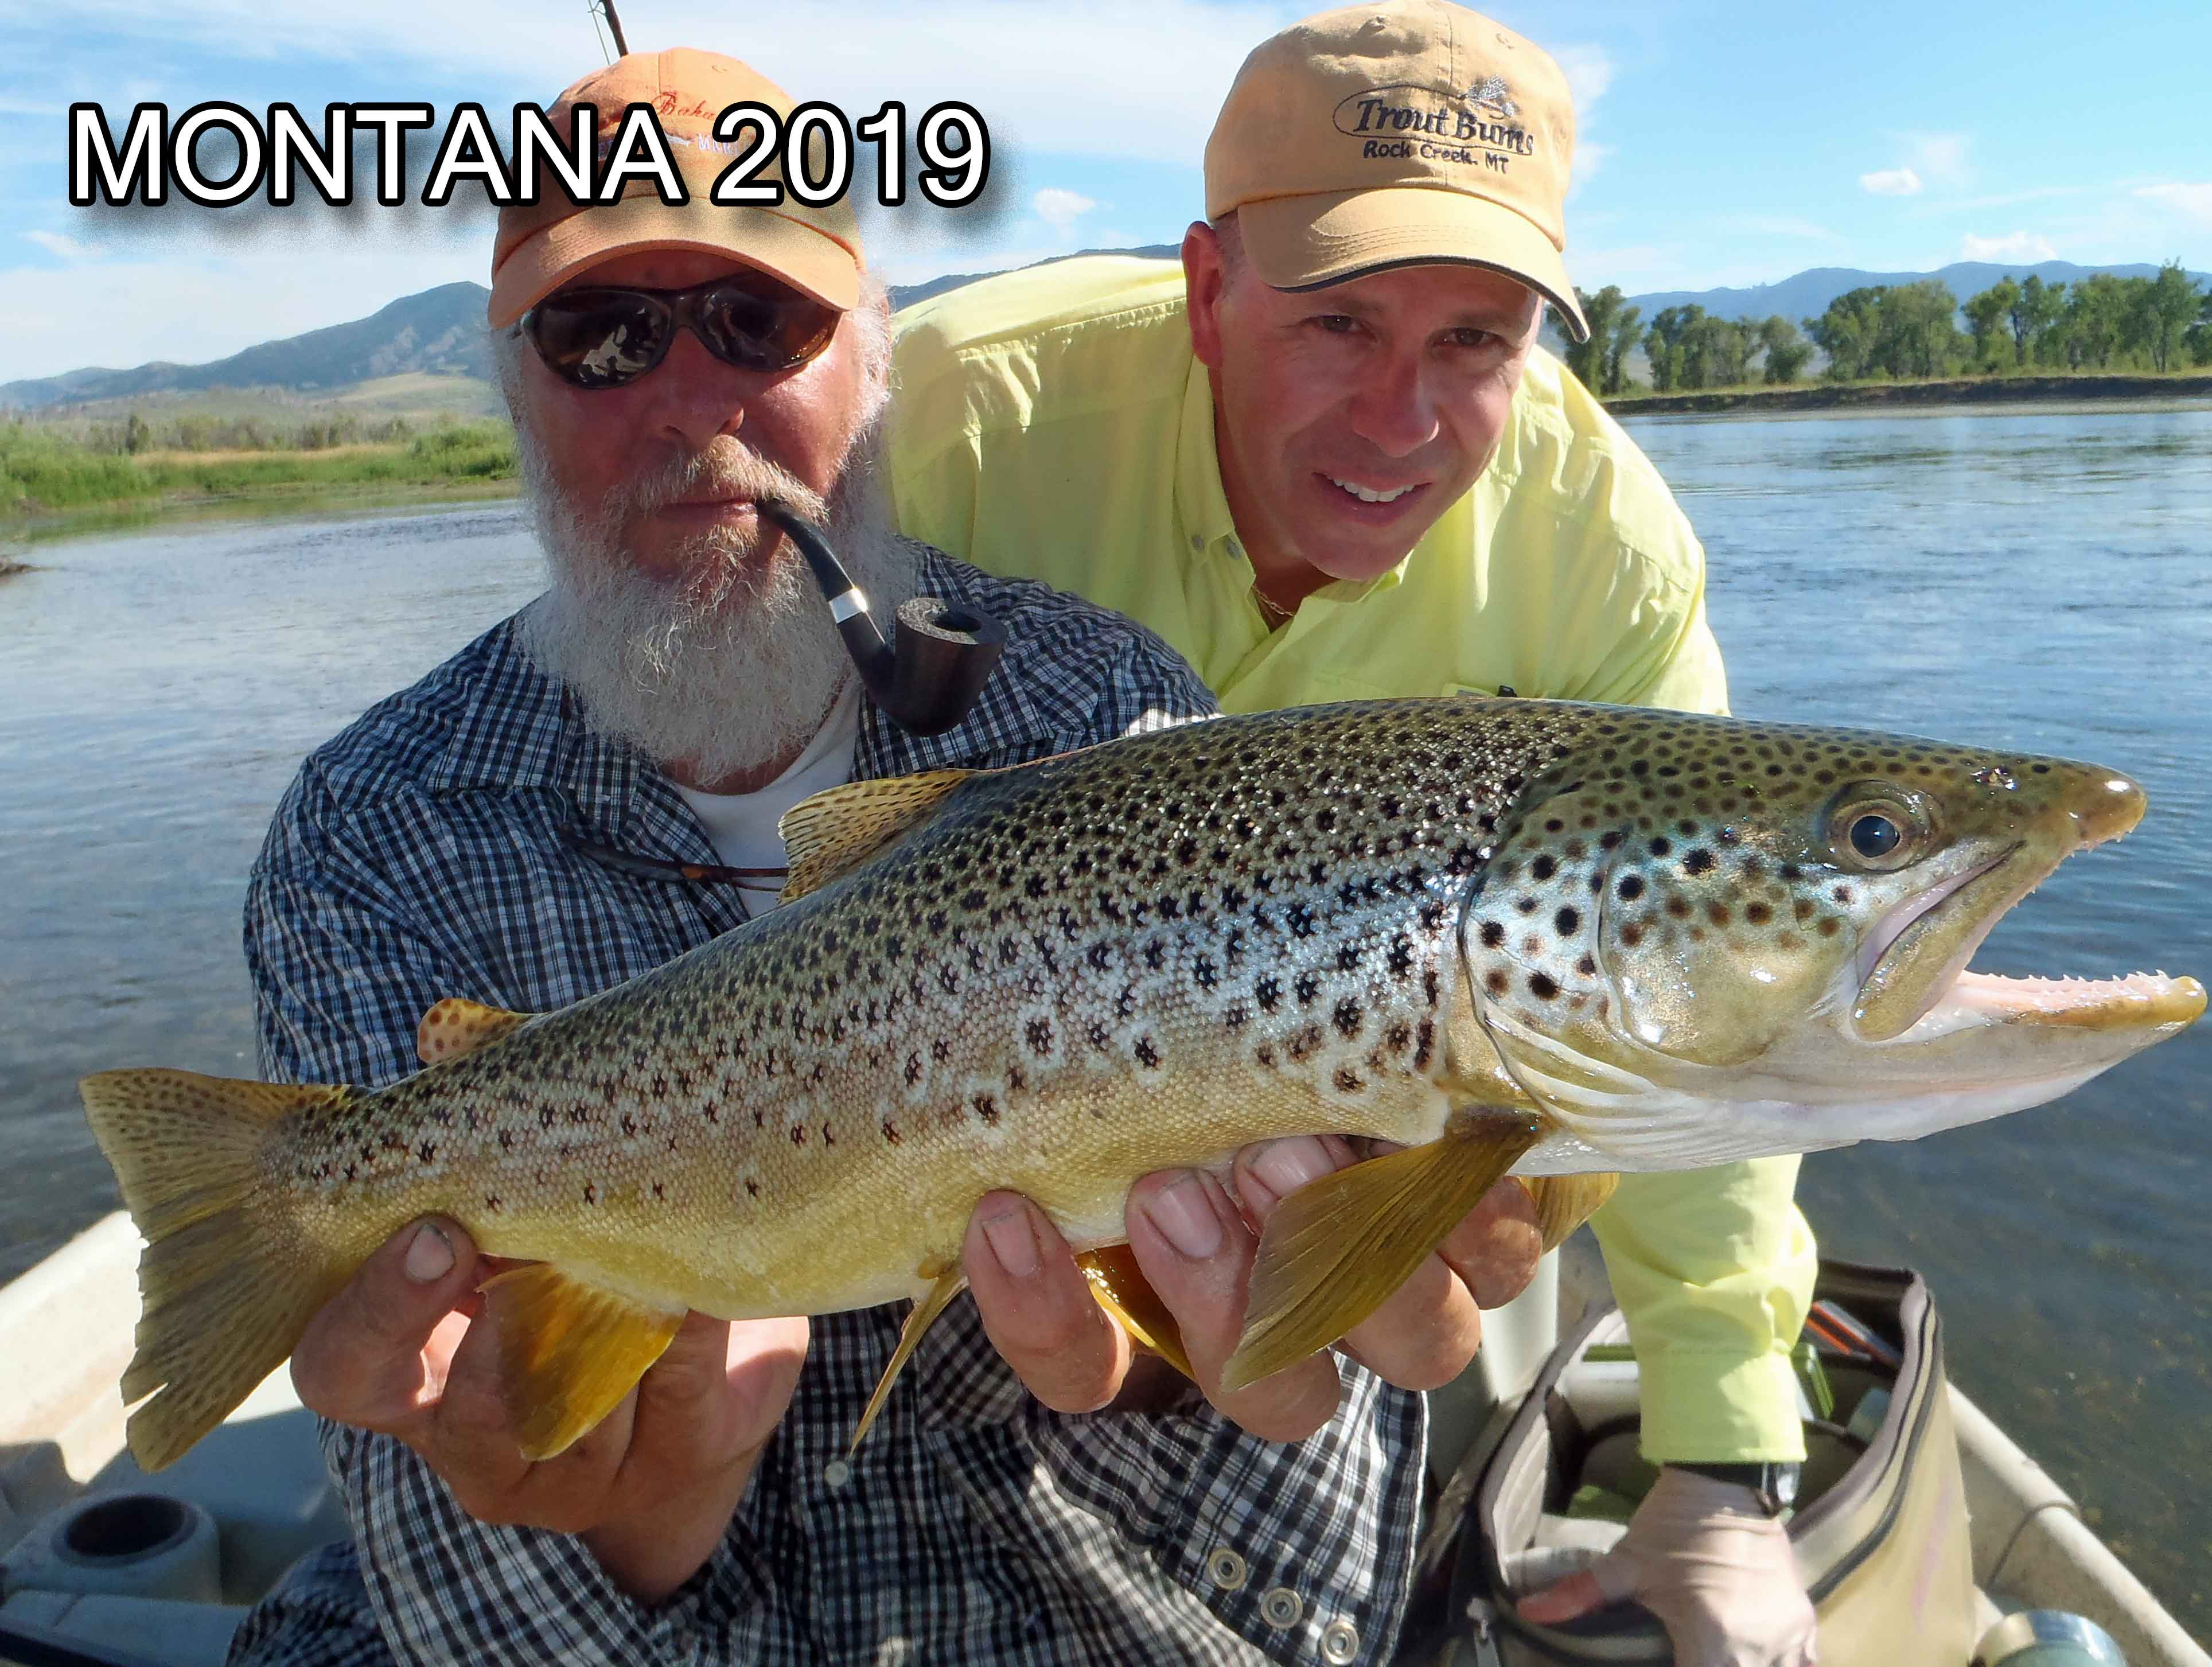 Destination Trips To Montana 2019